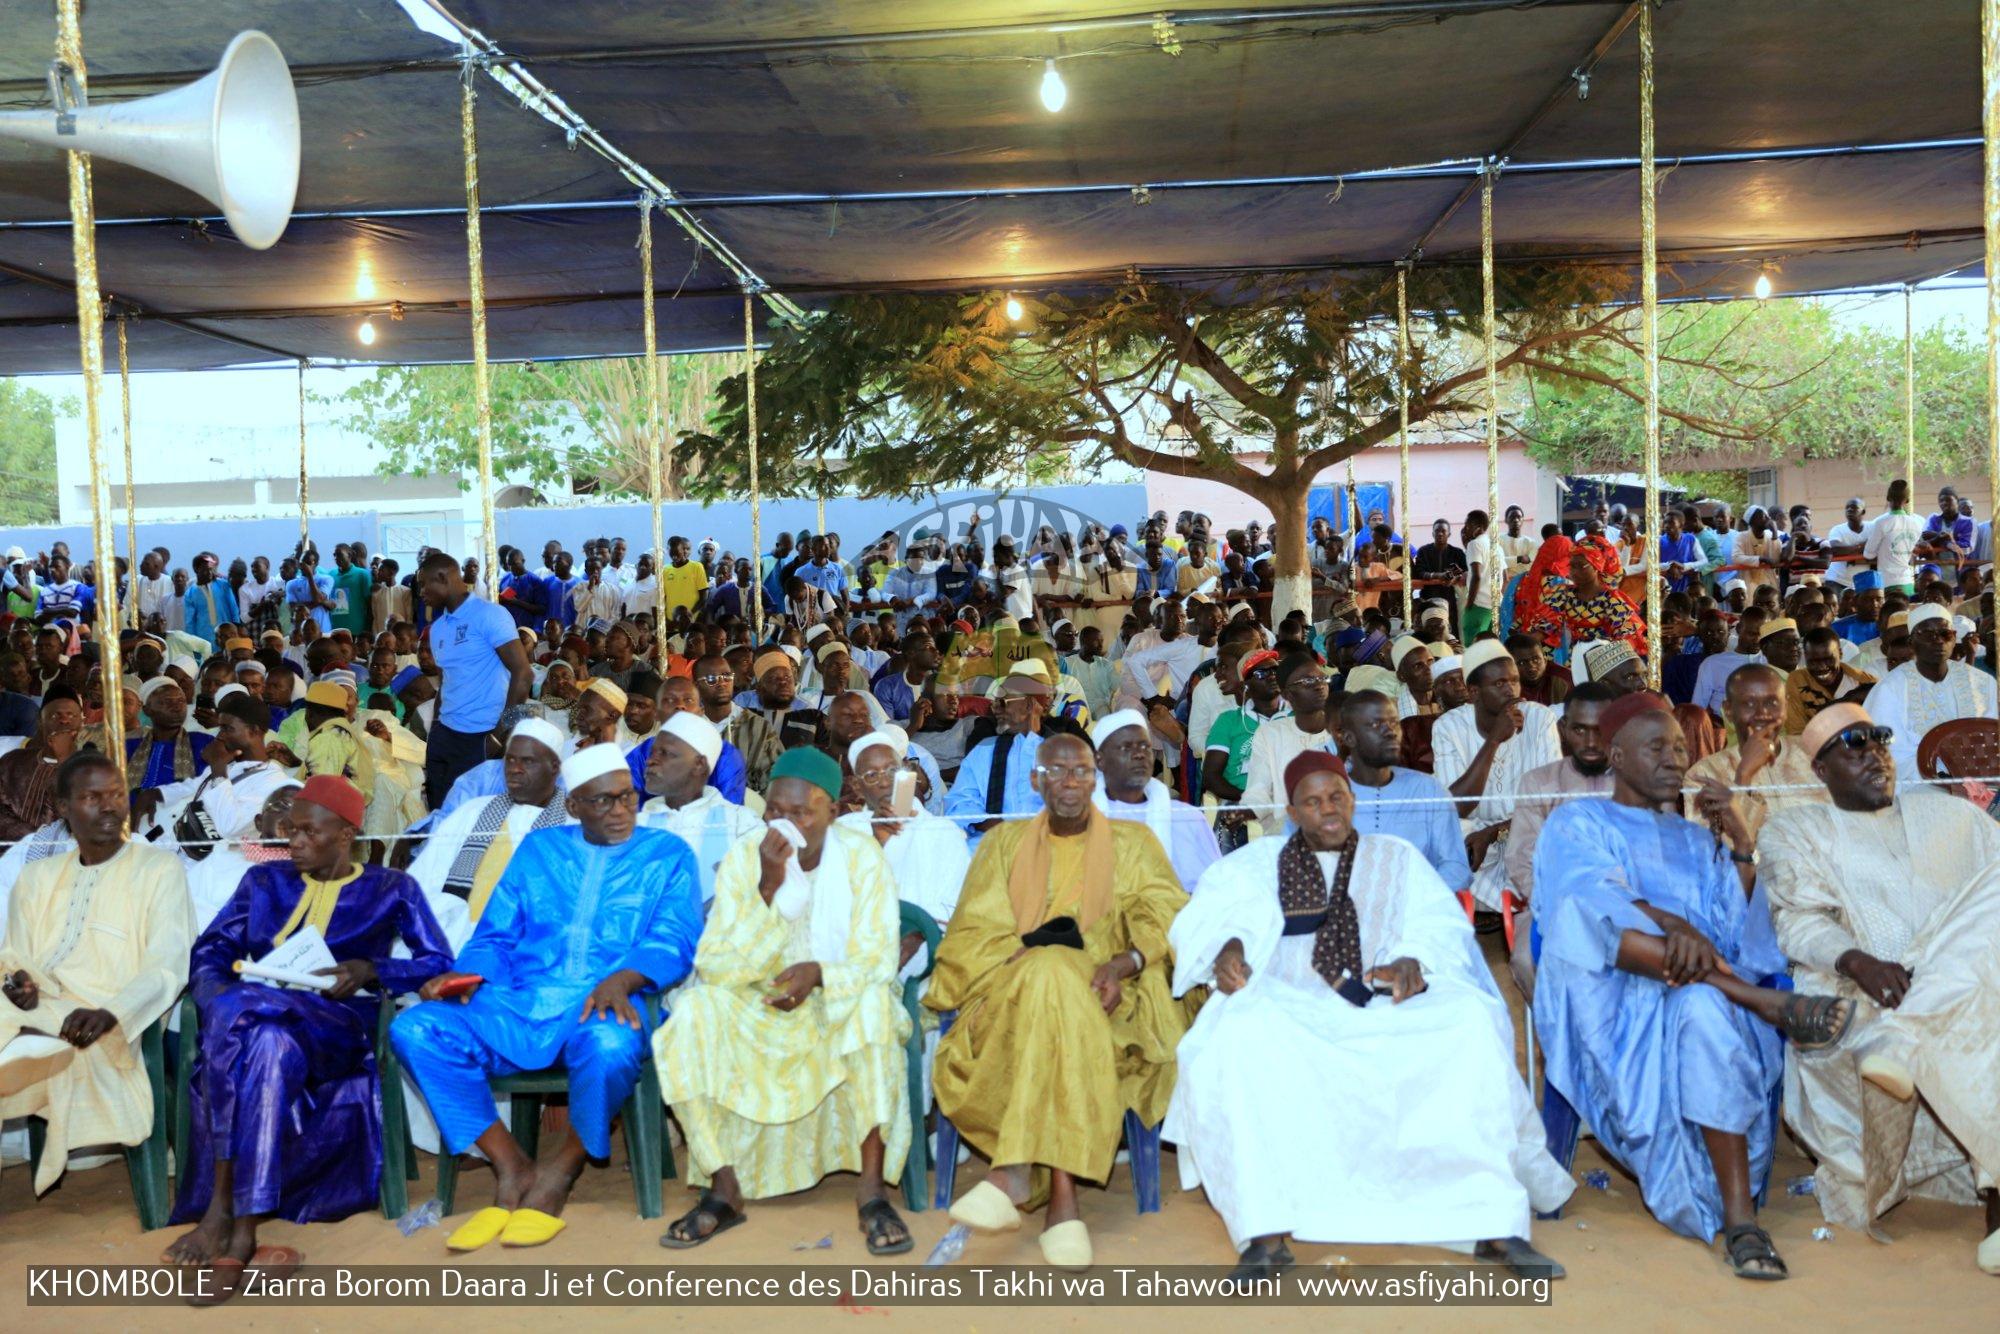 PHOTOS -KHOMBOLE : Les Images de la Ziarra Borom Daara Ji et Conference des Dahiras Takhi Wa Tahawouni , Samedi 13 Avril 2019